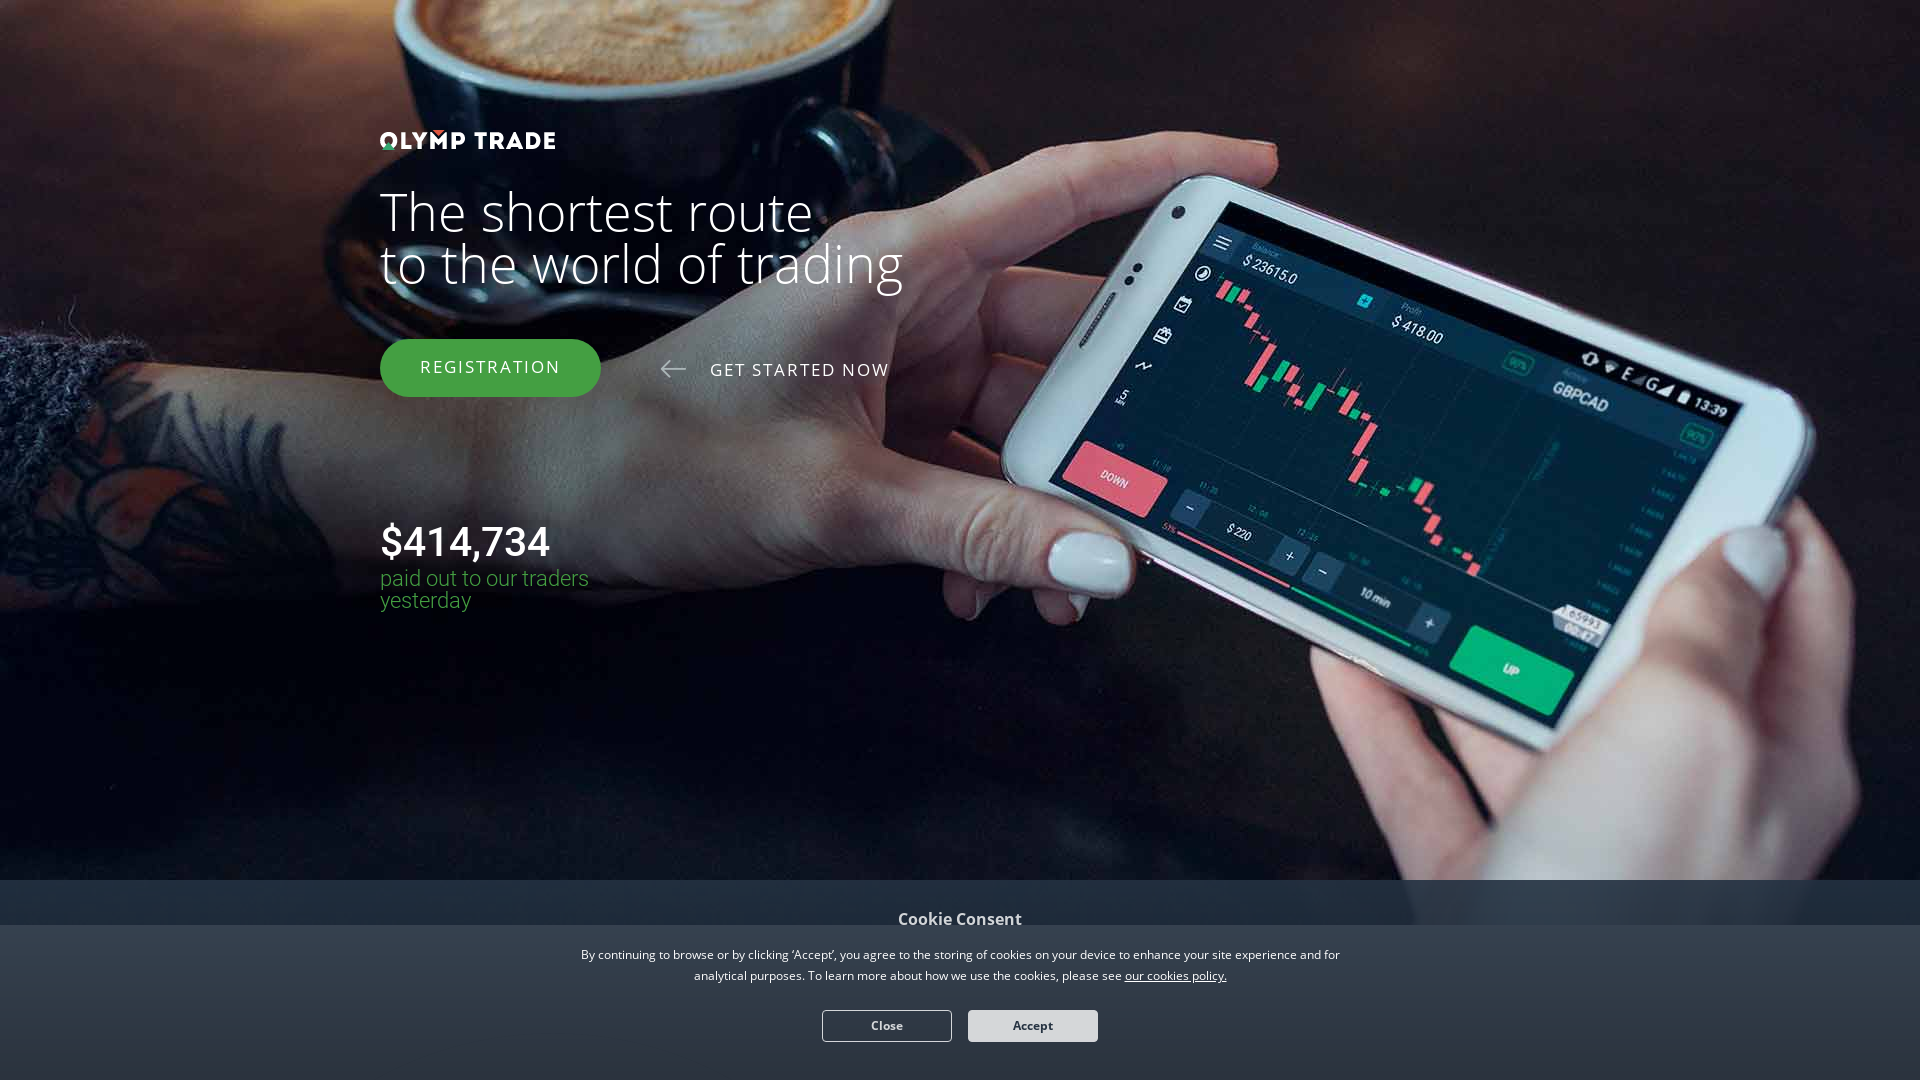 Olymp Trade website